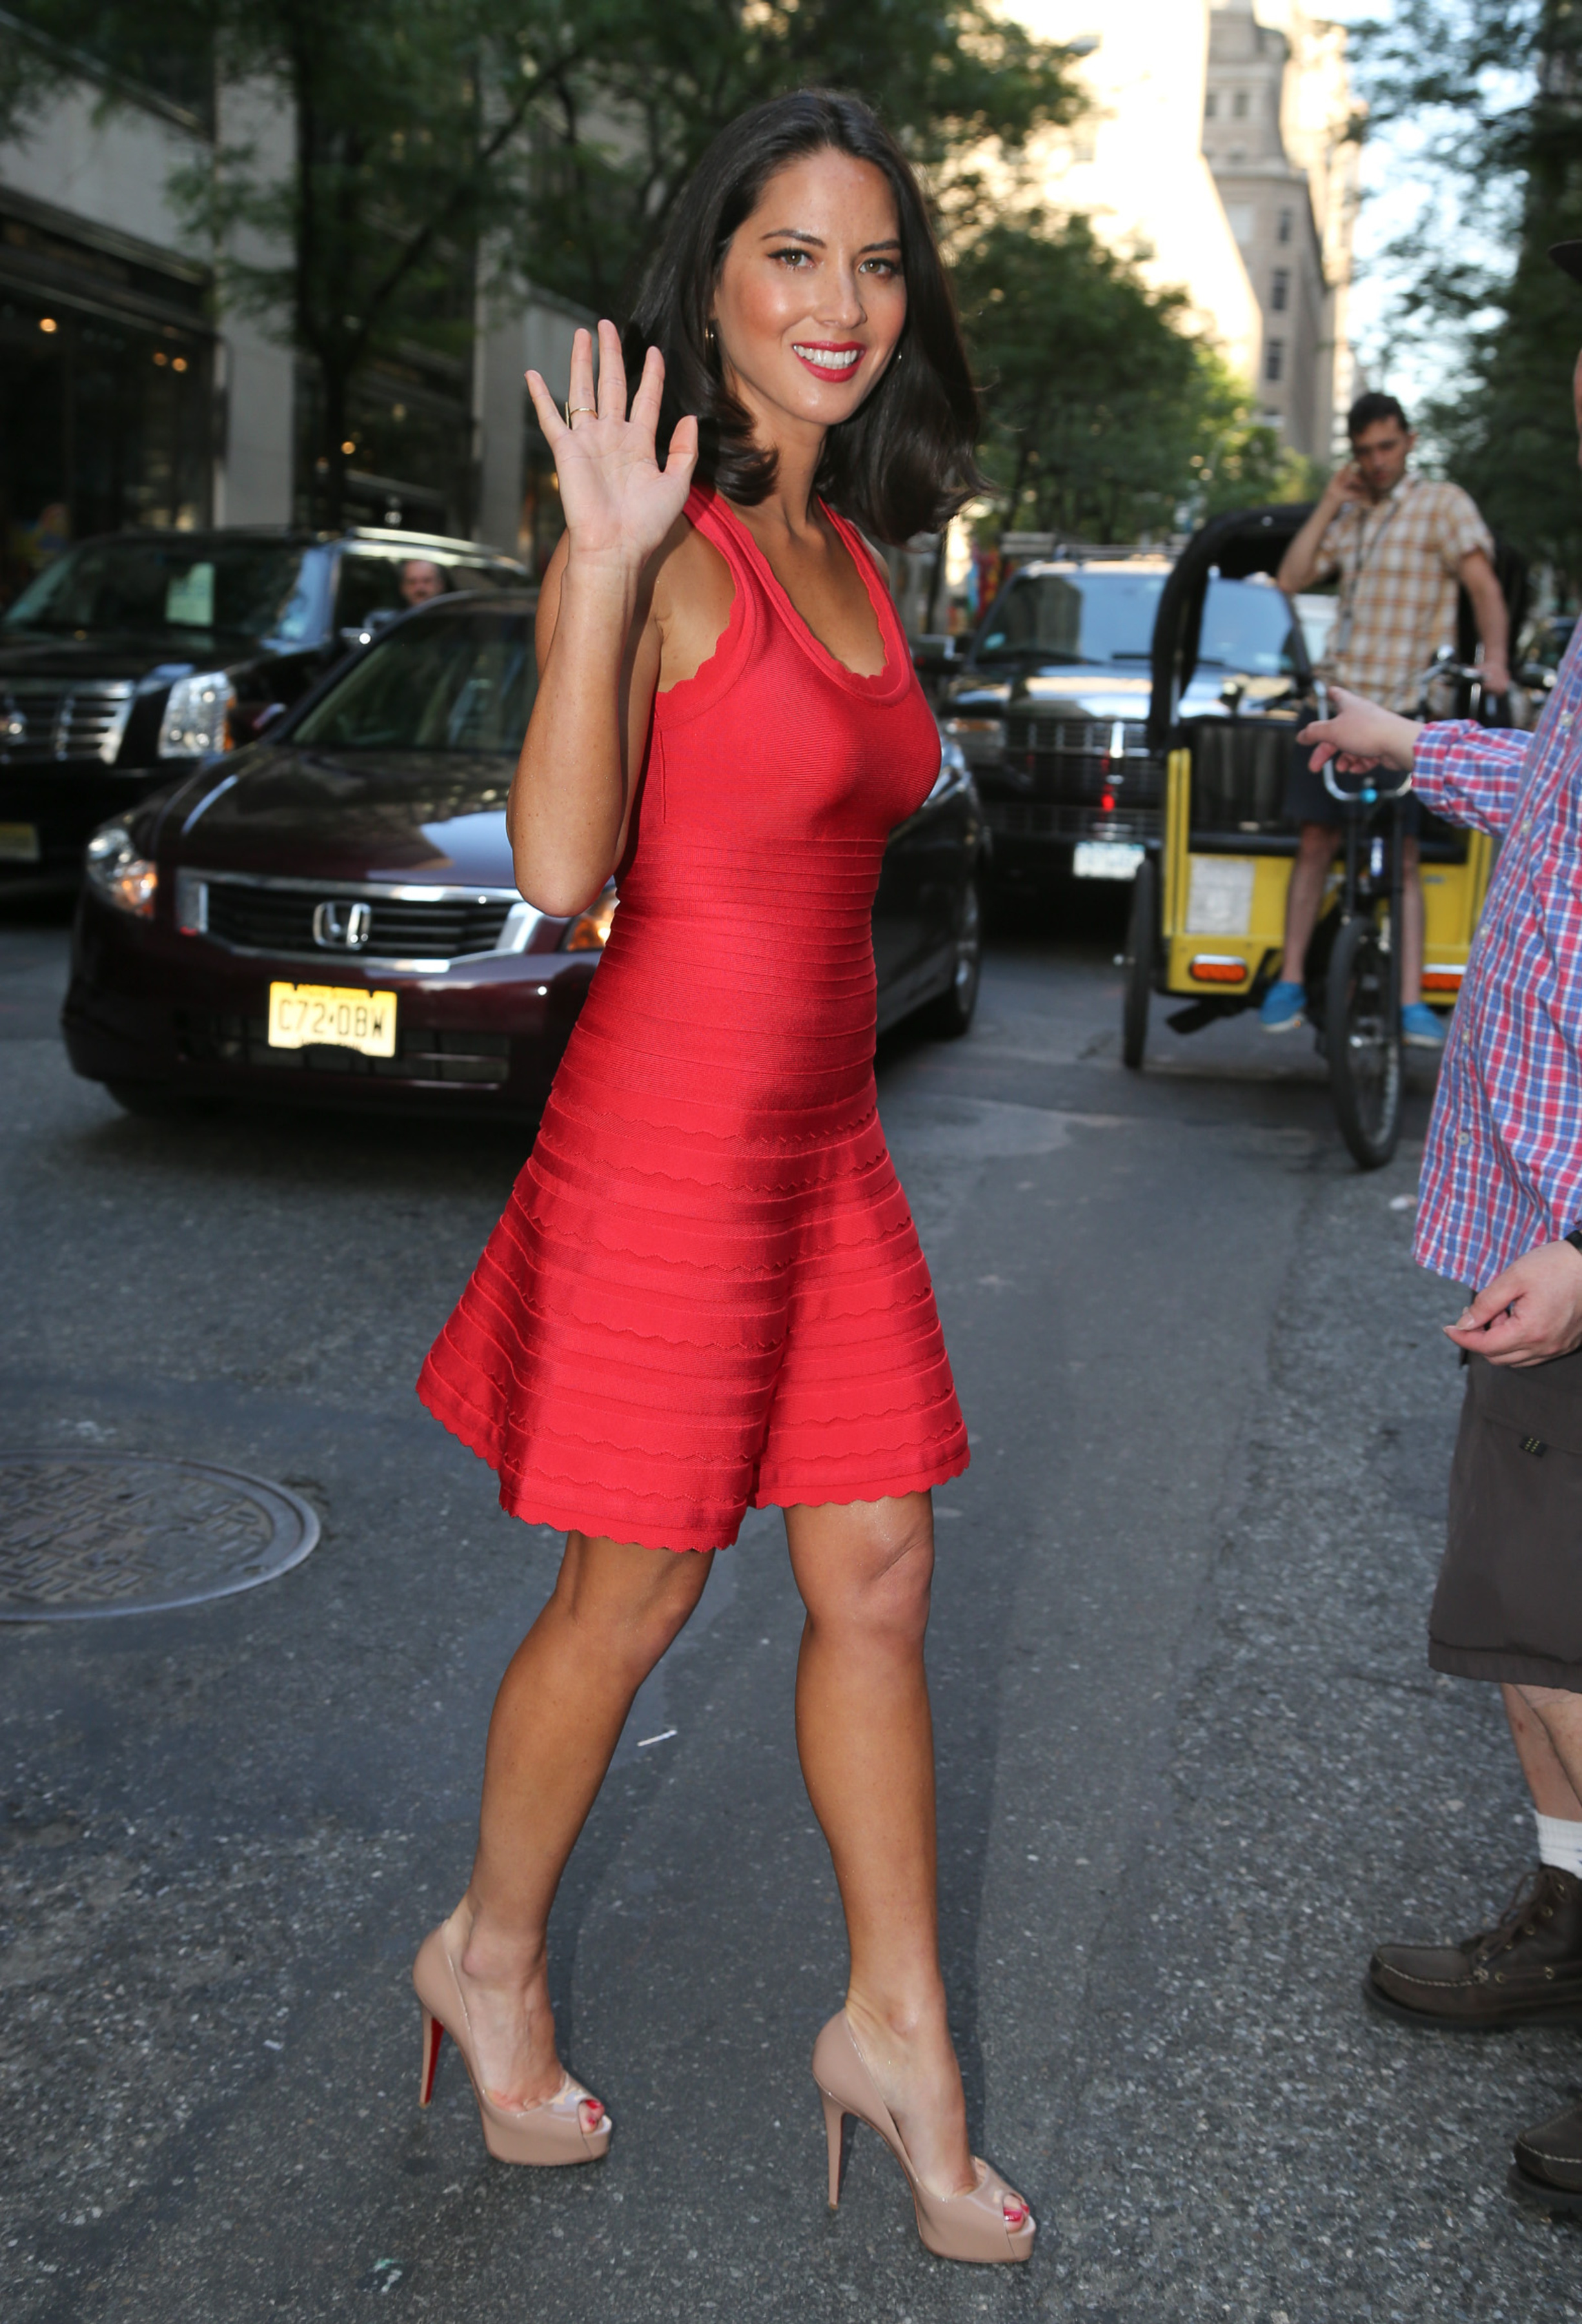 Olivia Munn on Jimmy Fallon - Dress Herve LegerShoes Christian Louboutin